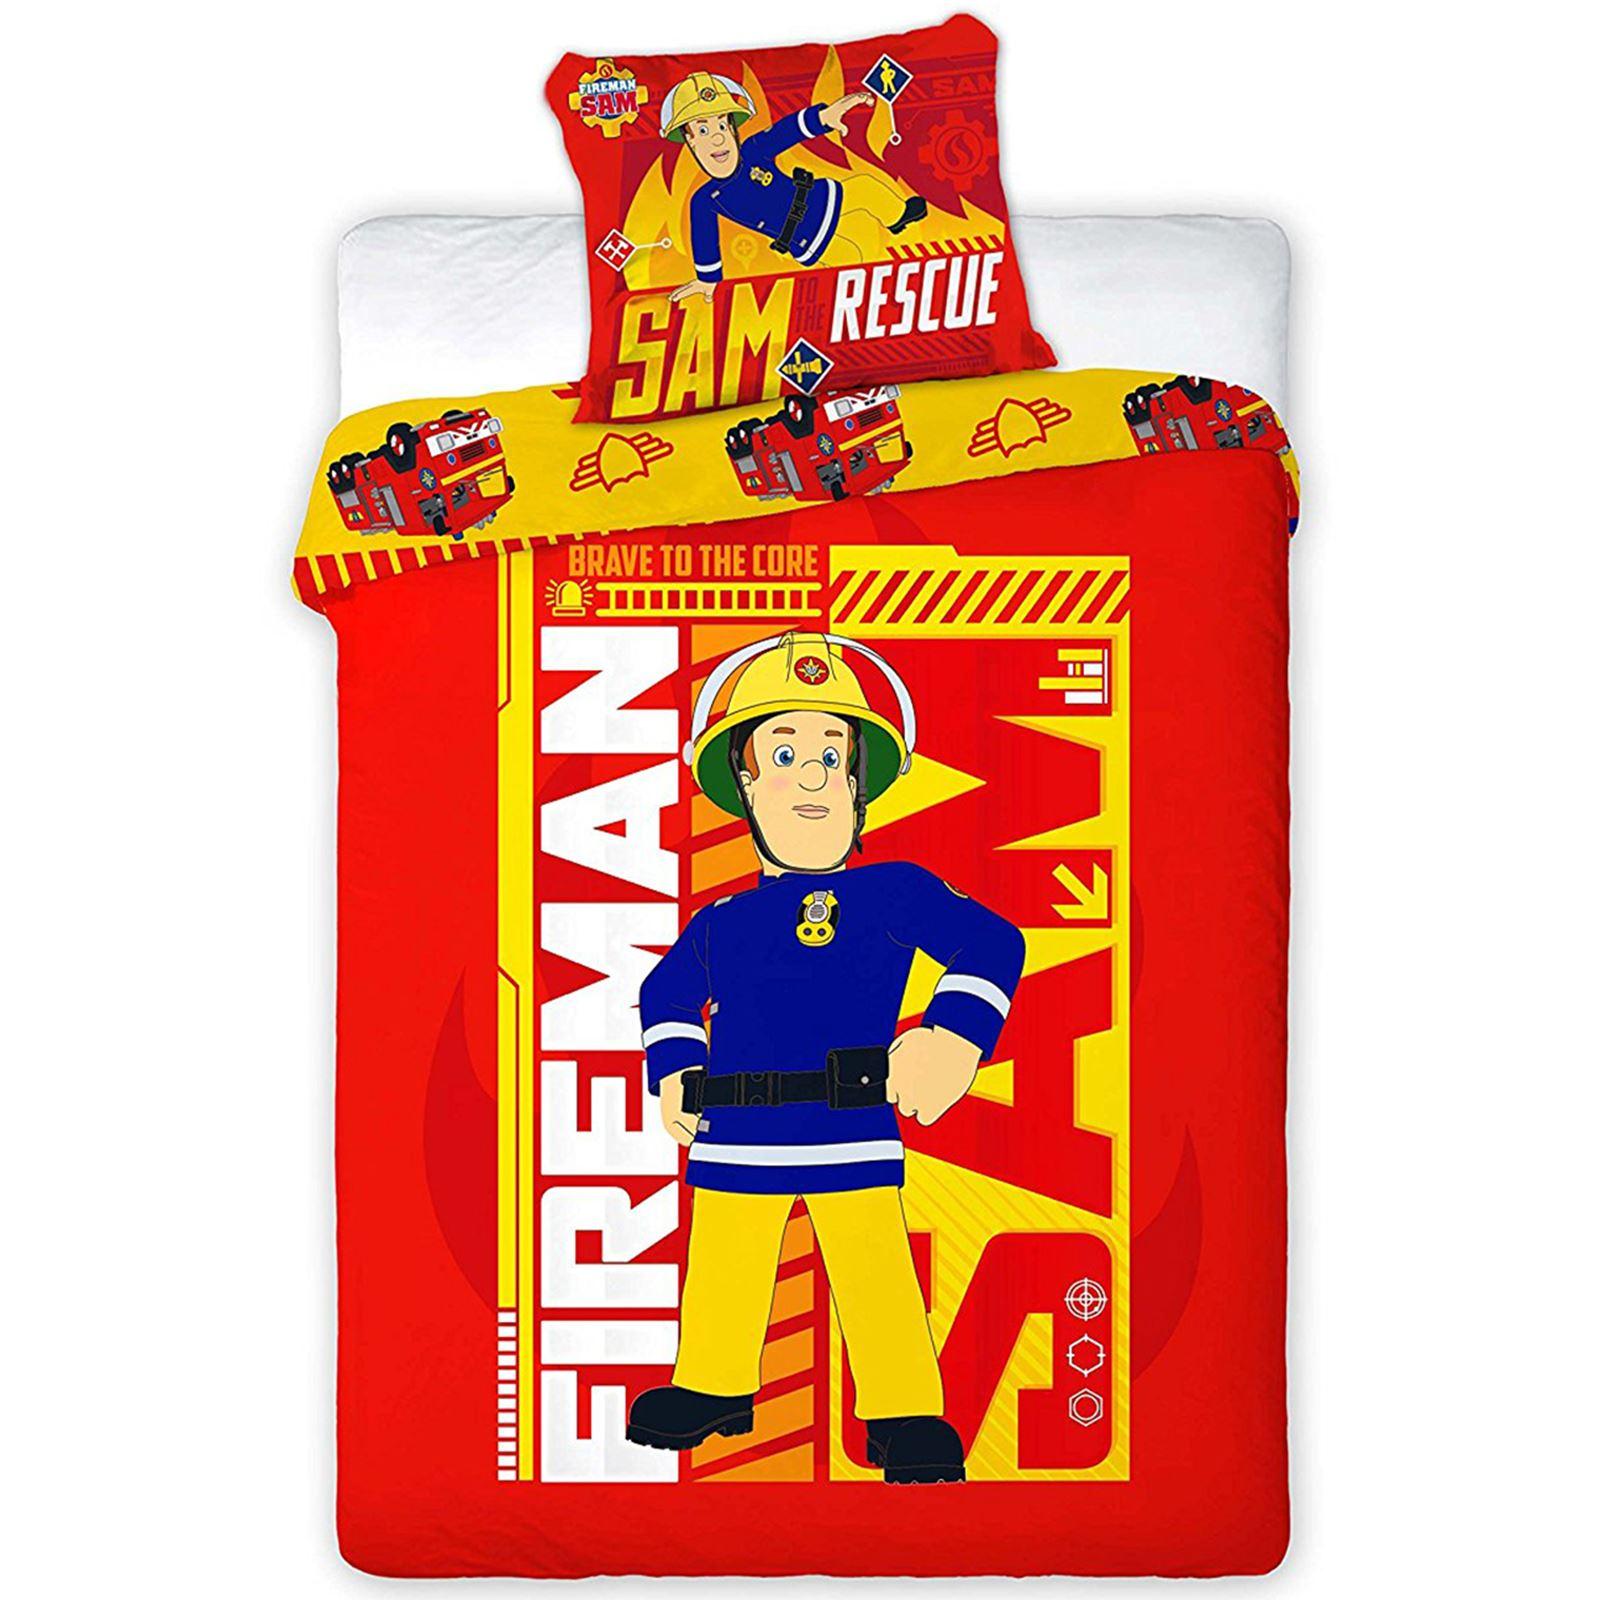 Fireman Sam Bedroom Accessories Double Bedroom Design Ideas Blue Wall Art Bedroom Bedroom Colour Design 2015: SINGLE DOUBLE & JUNIOR DUVET COVER